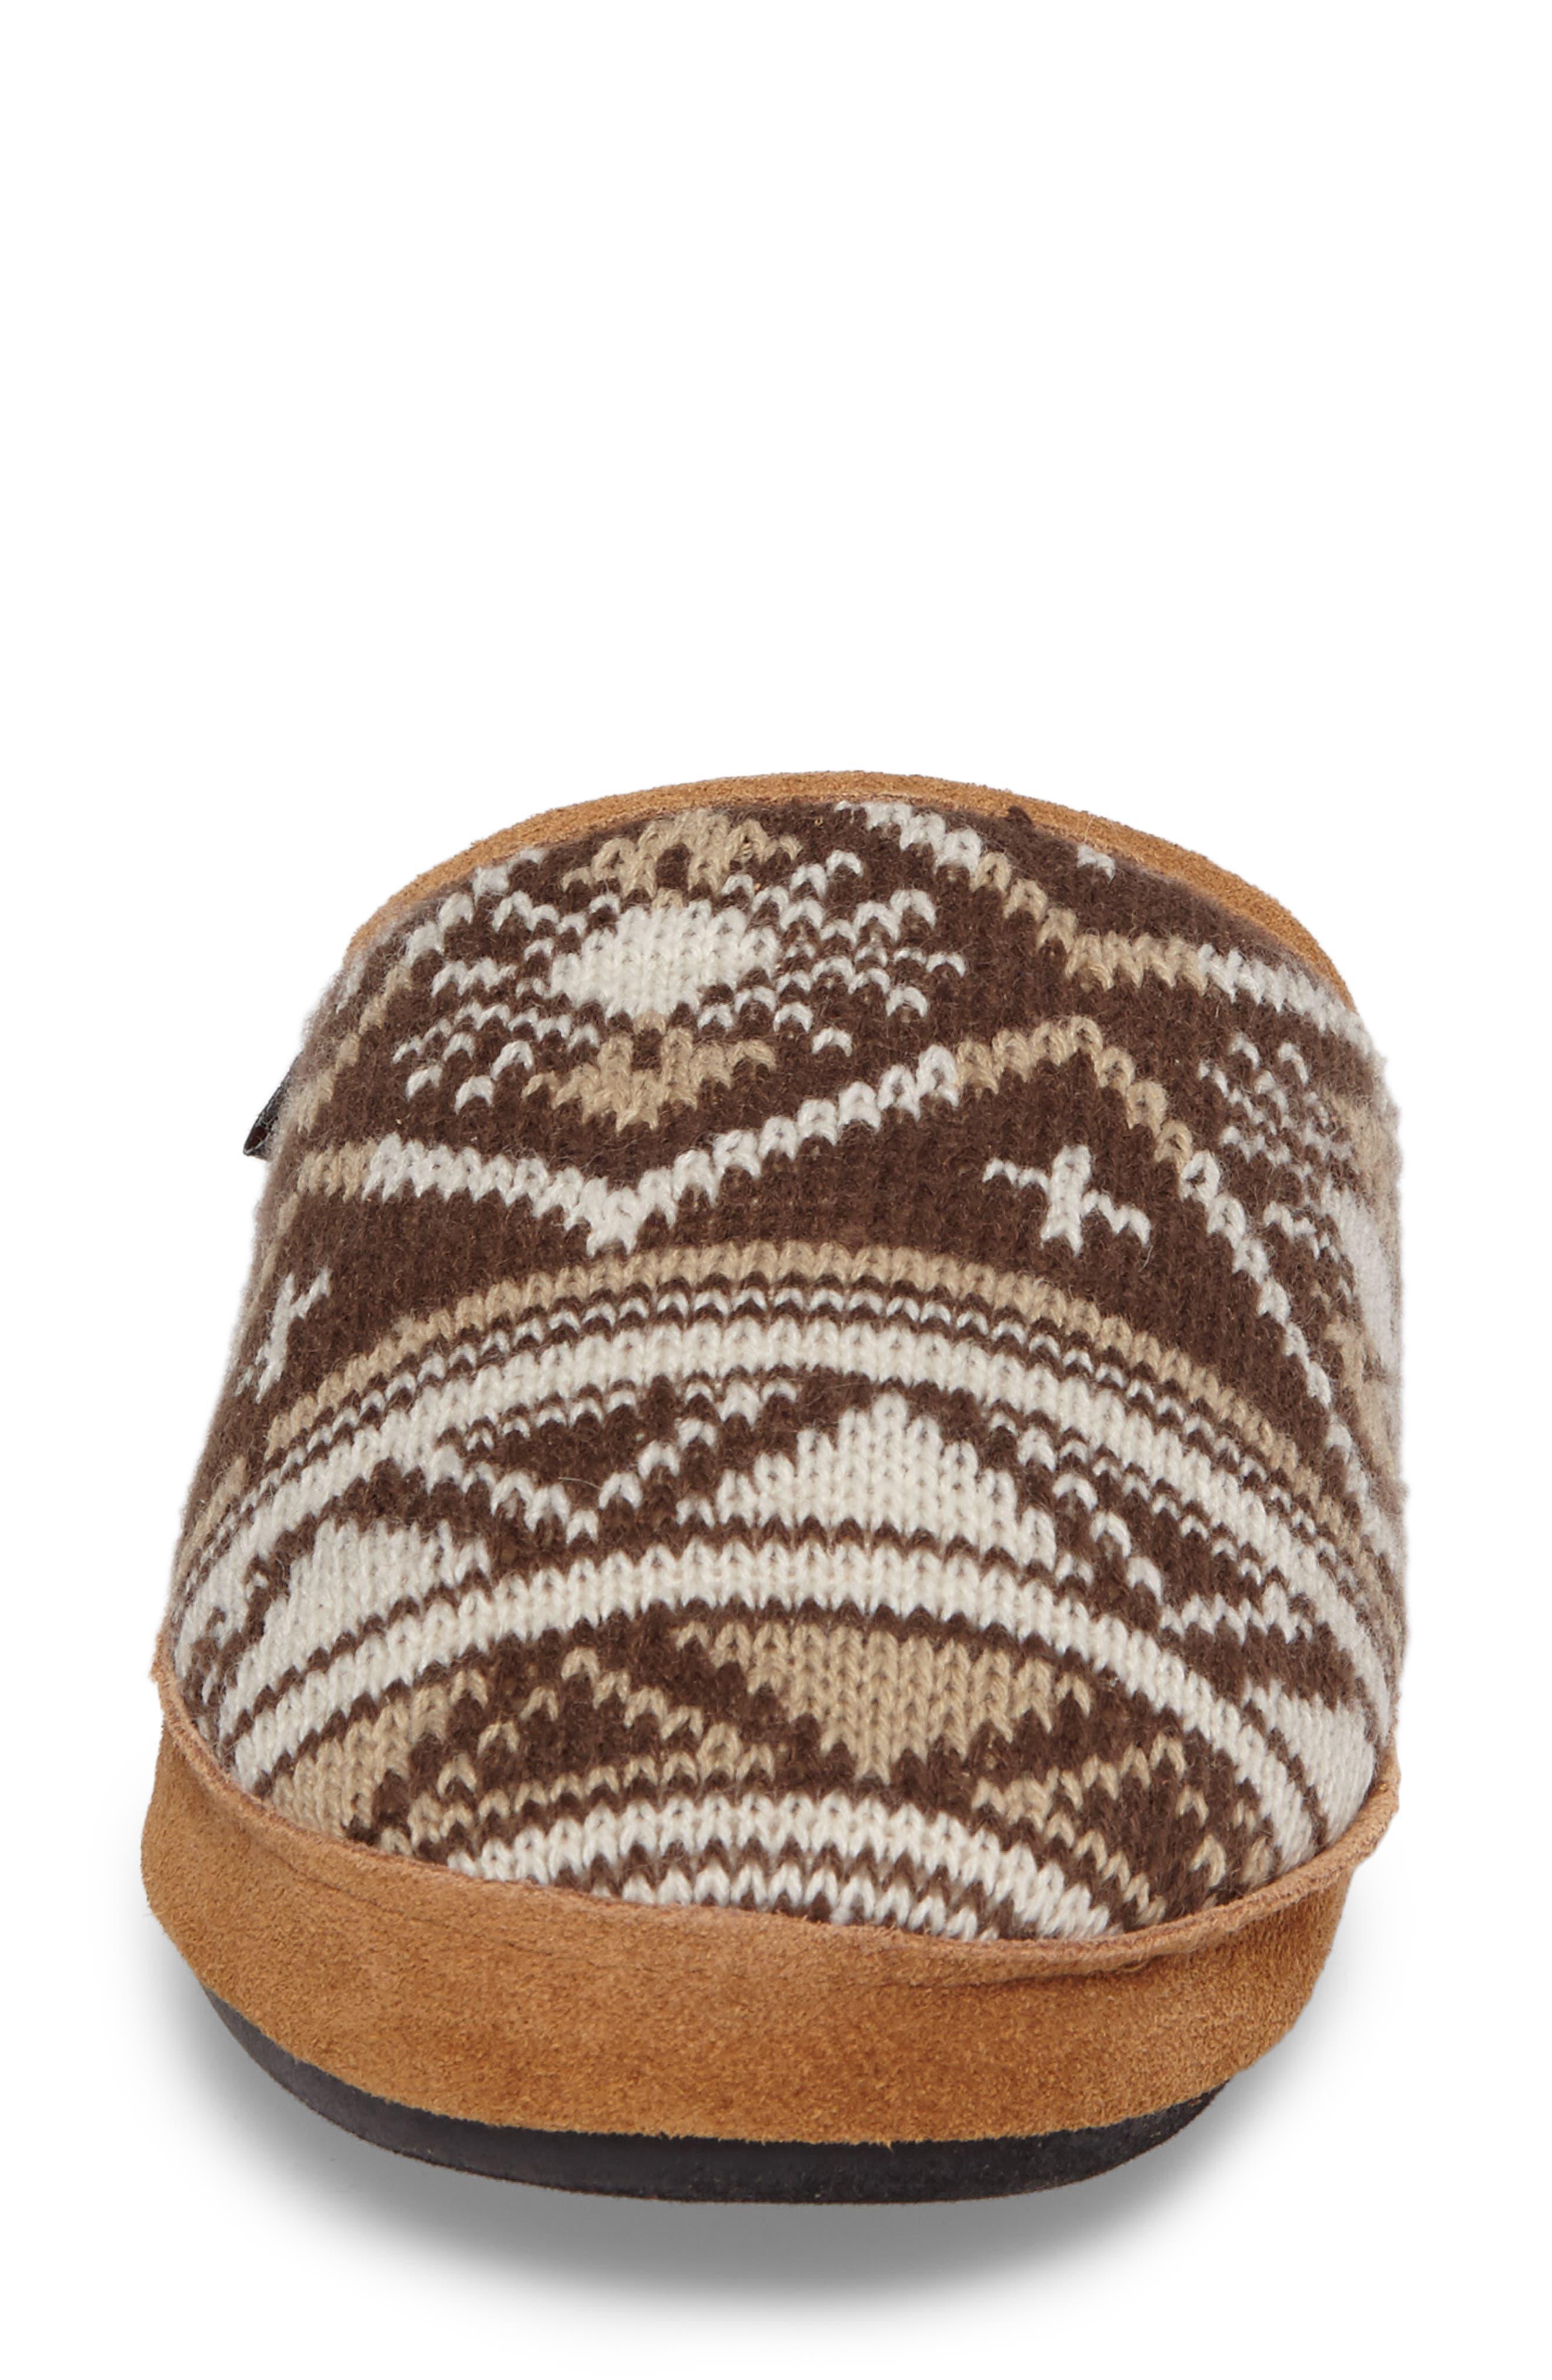 Whitecap Knit Slipper,                             Alternate thumbnail 4, color,                             235